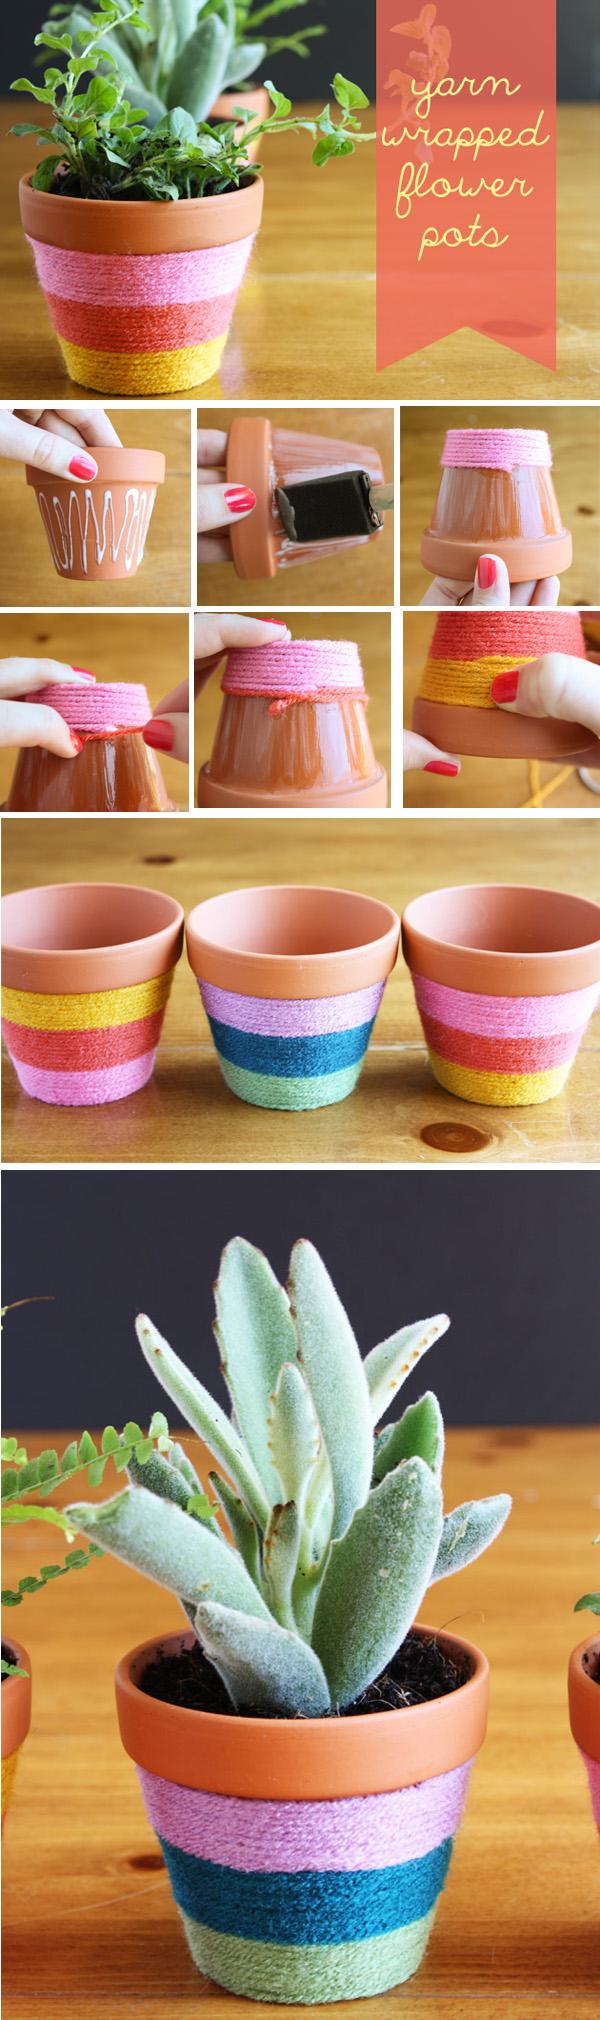 DIY ιδέες με γλάστρες7